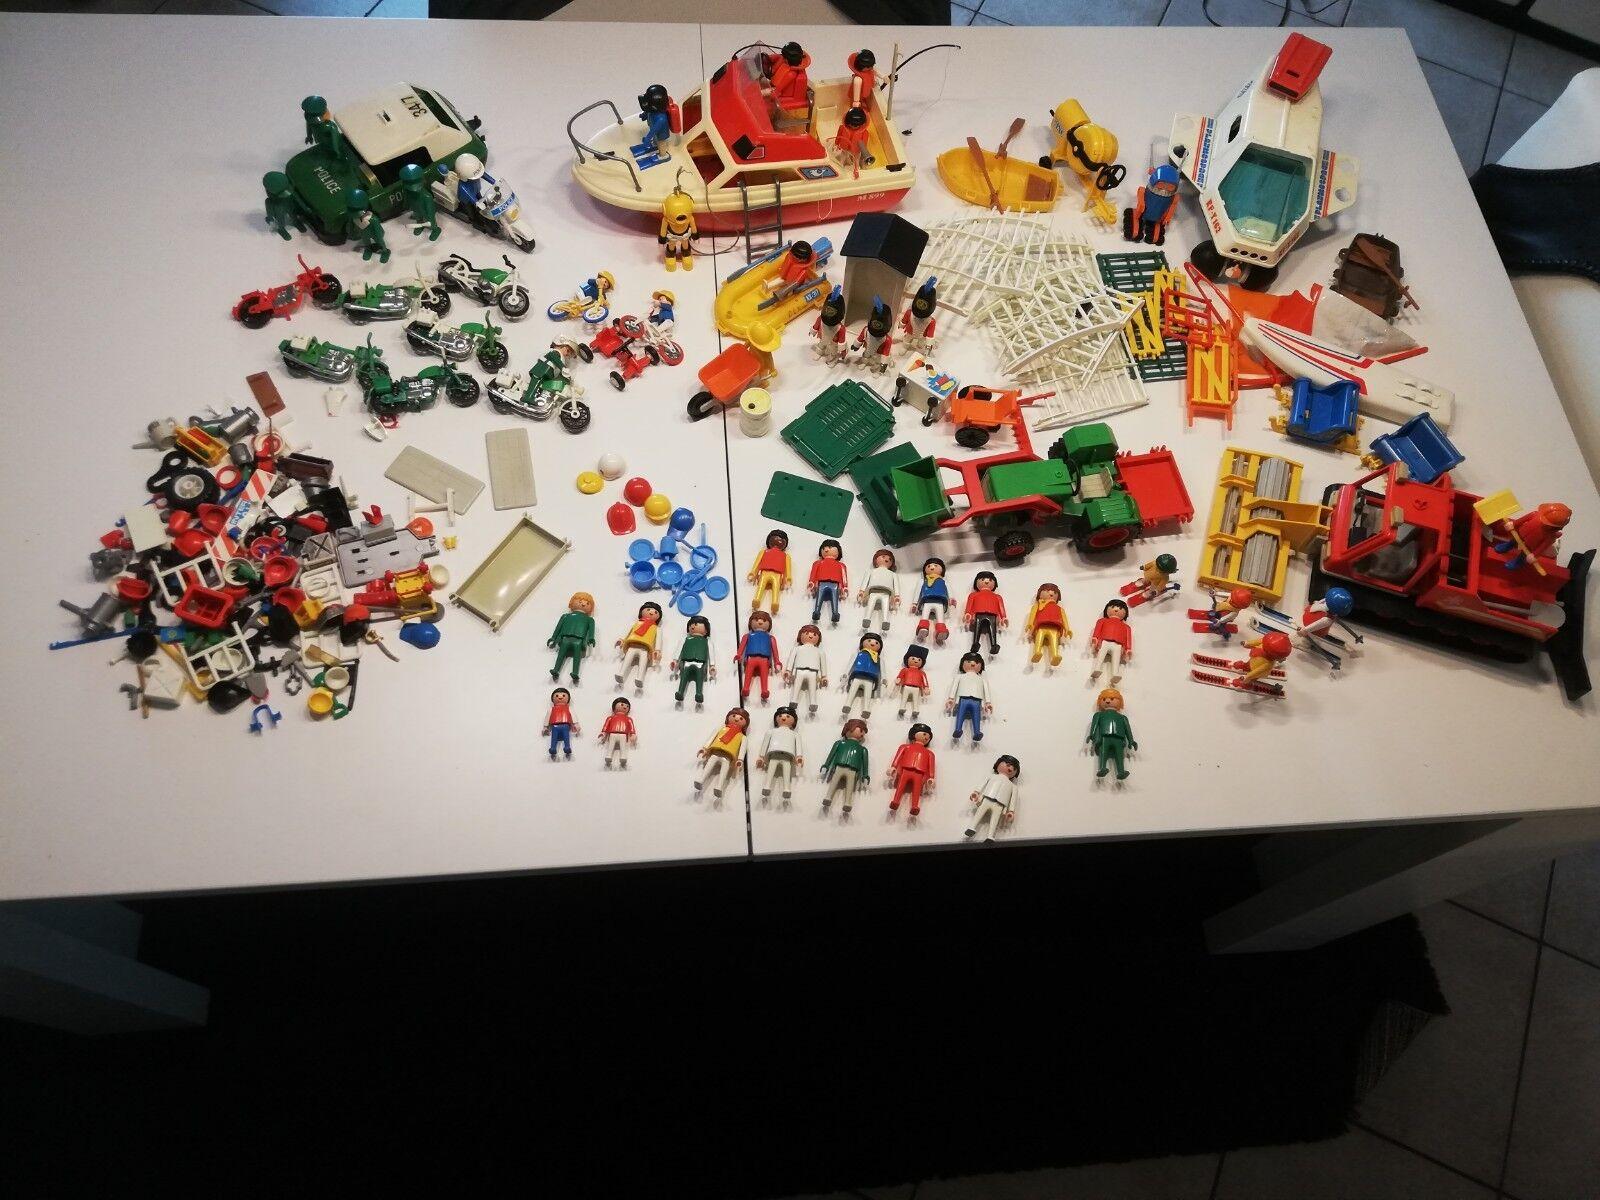 Playmobil  Dachbodenfund Konvolut Sammlung Figuren